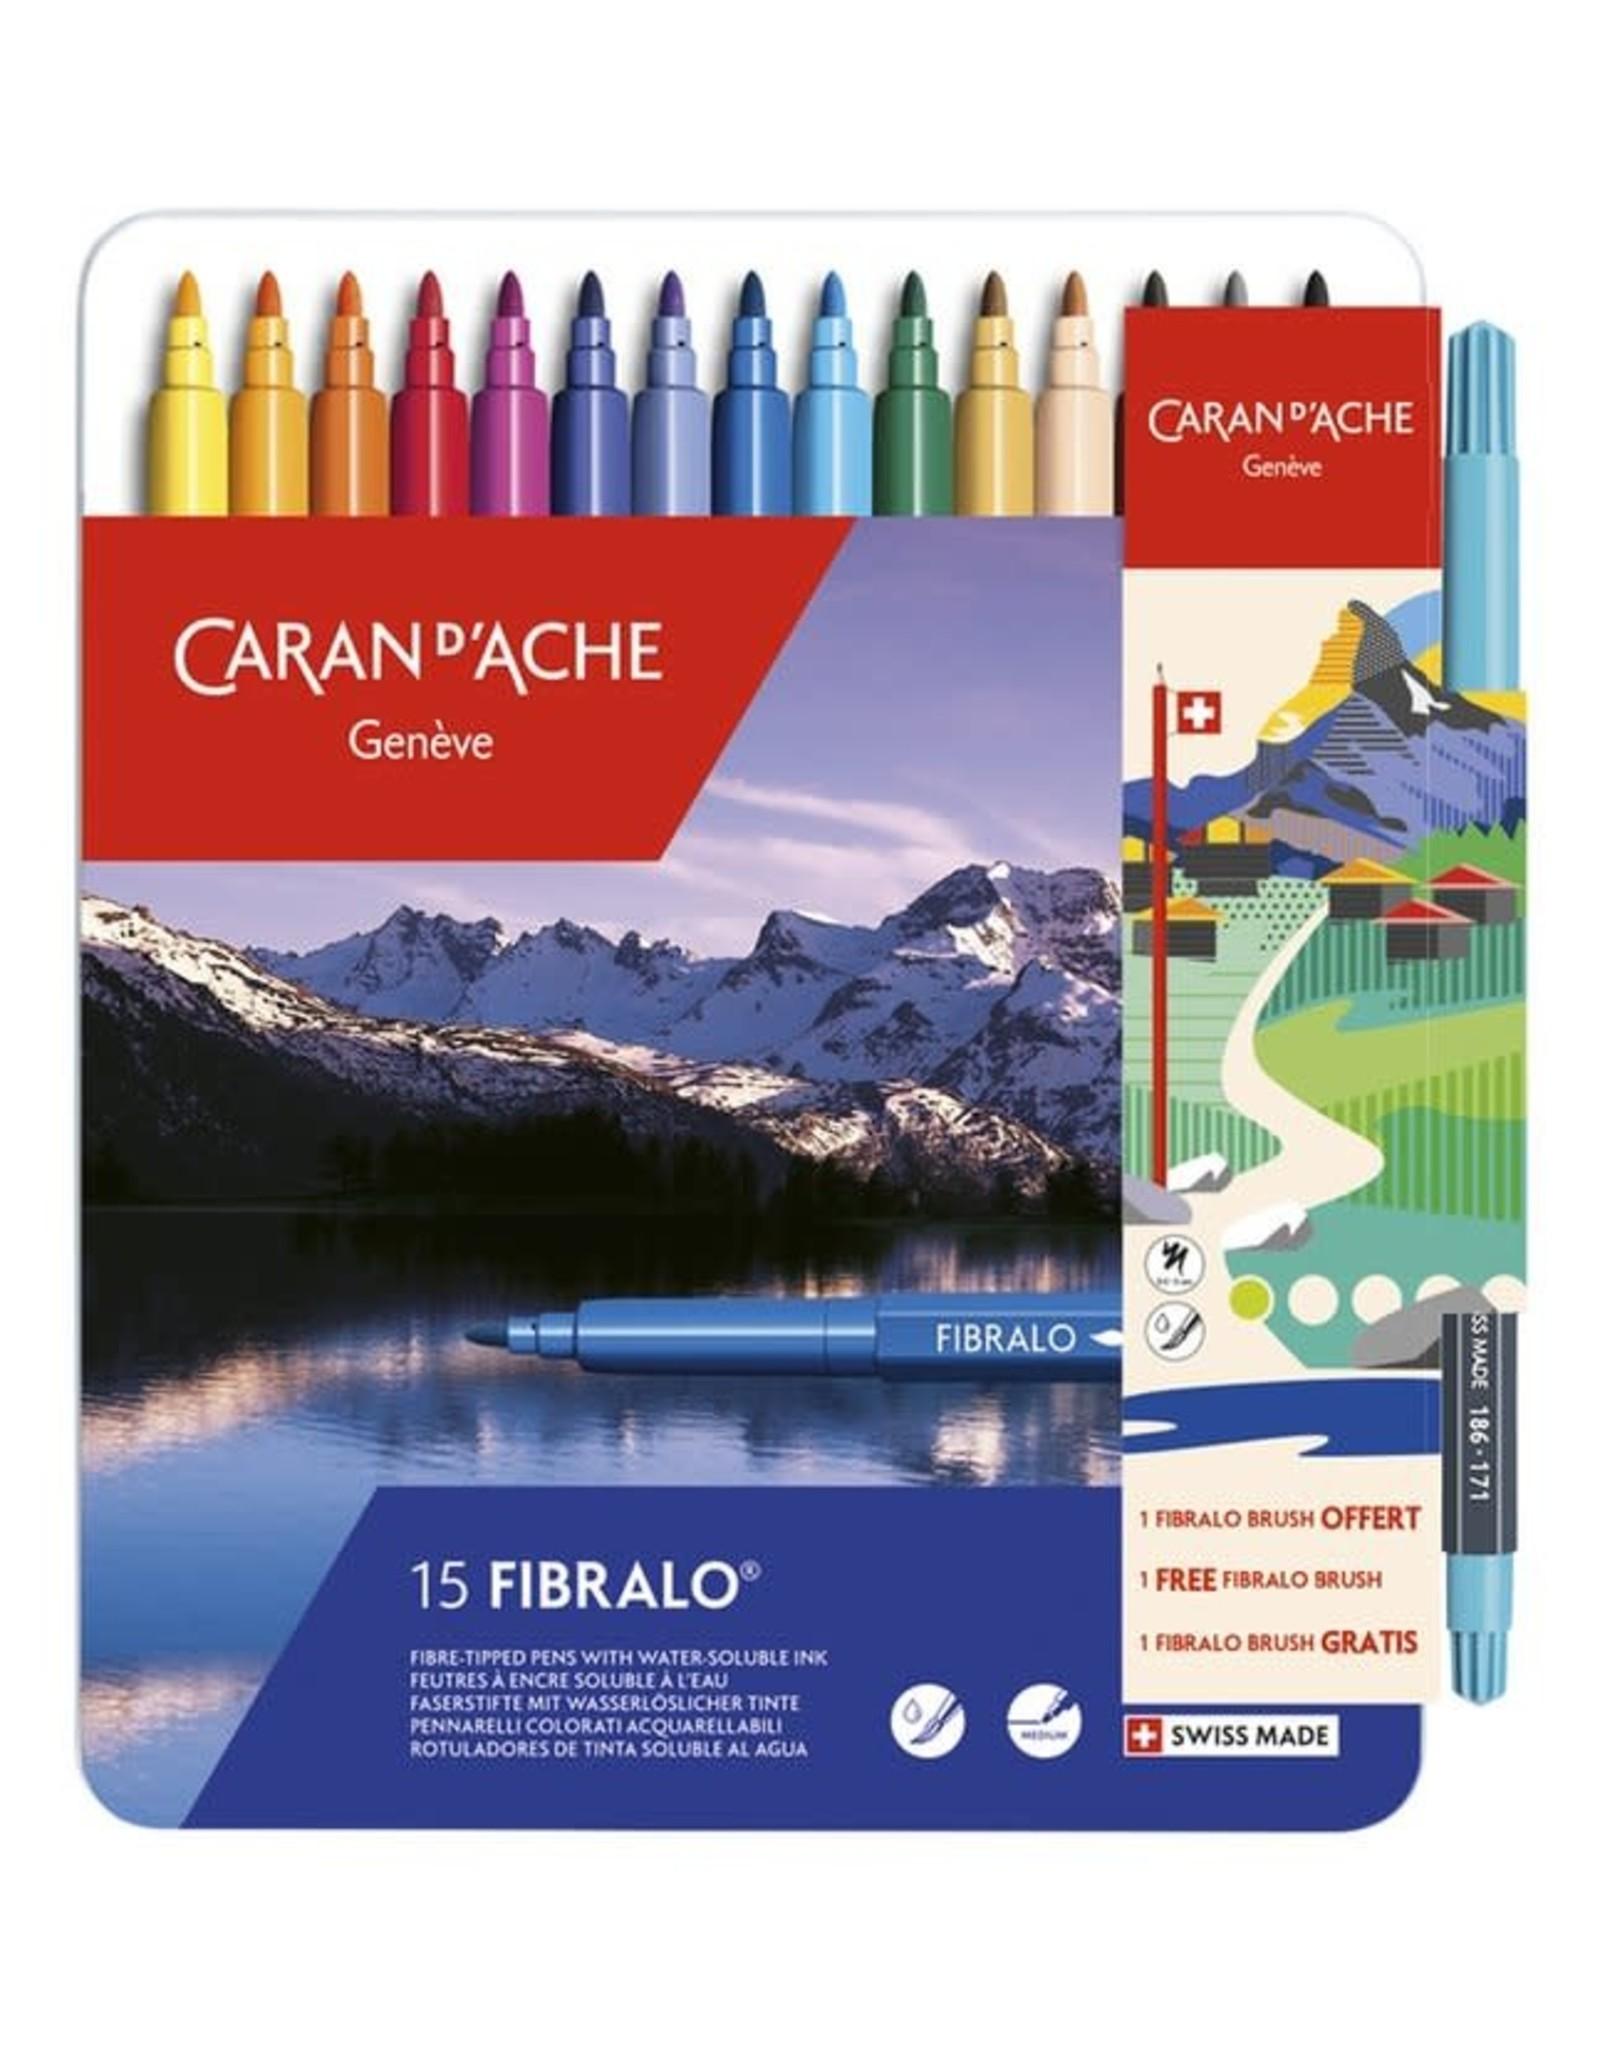 Caran d'Ache Fibralo 15 +1